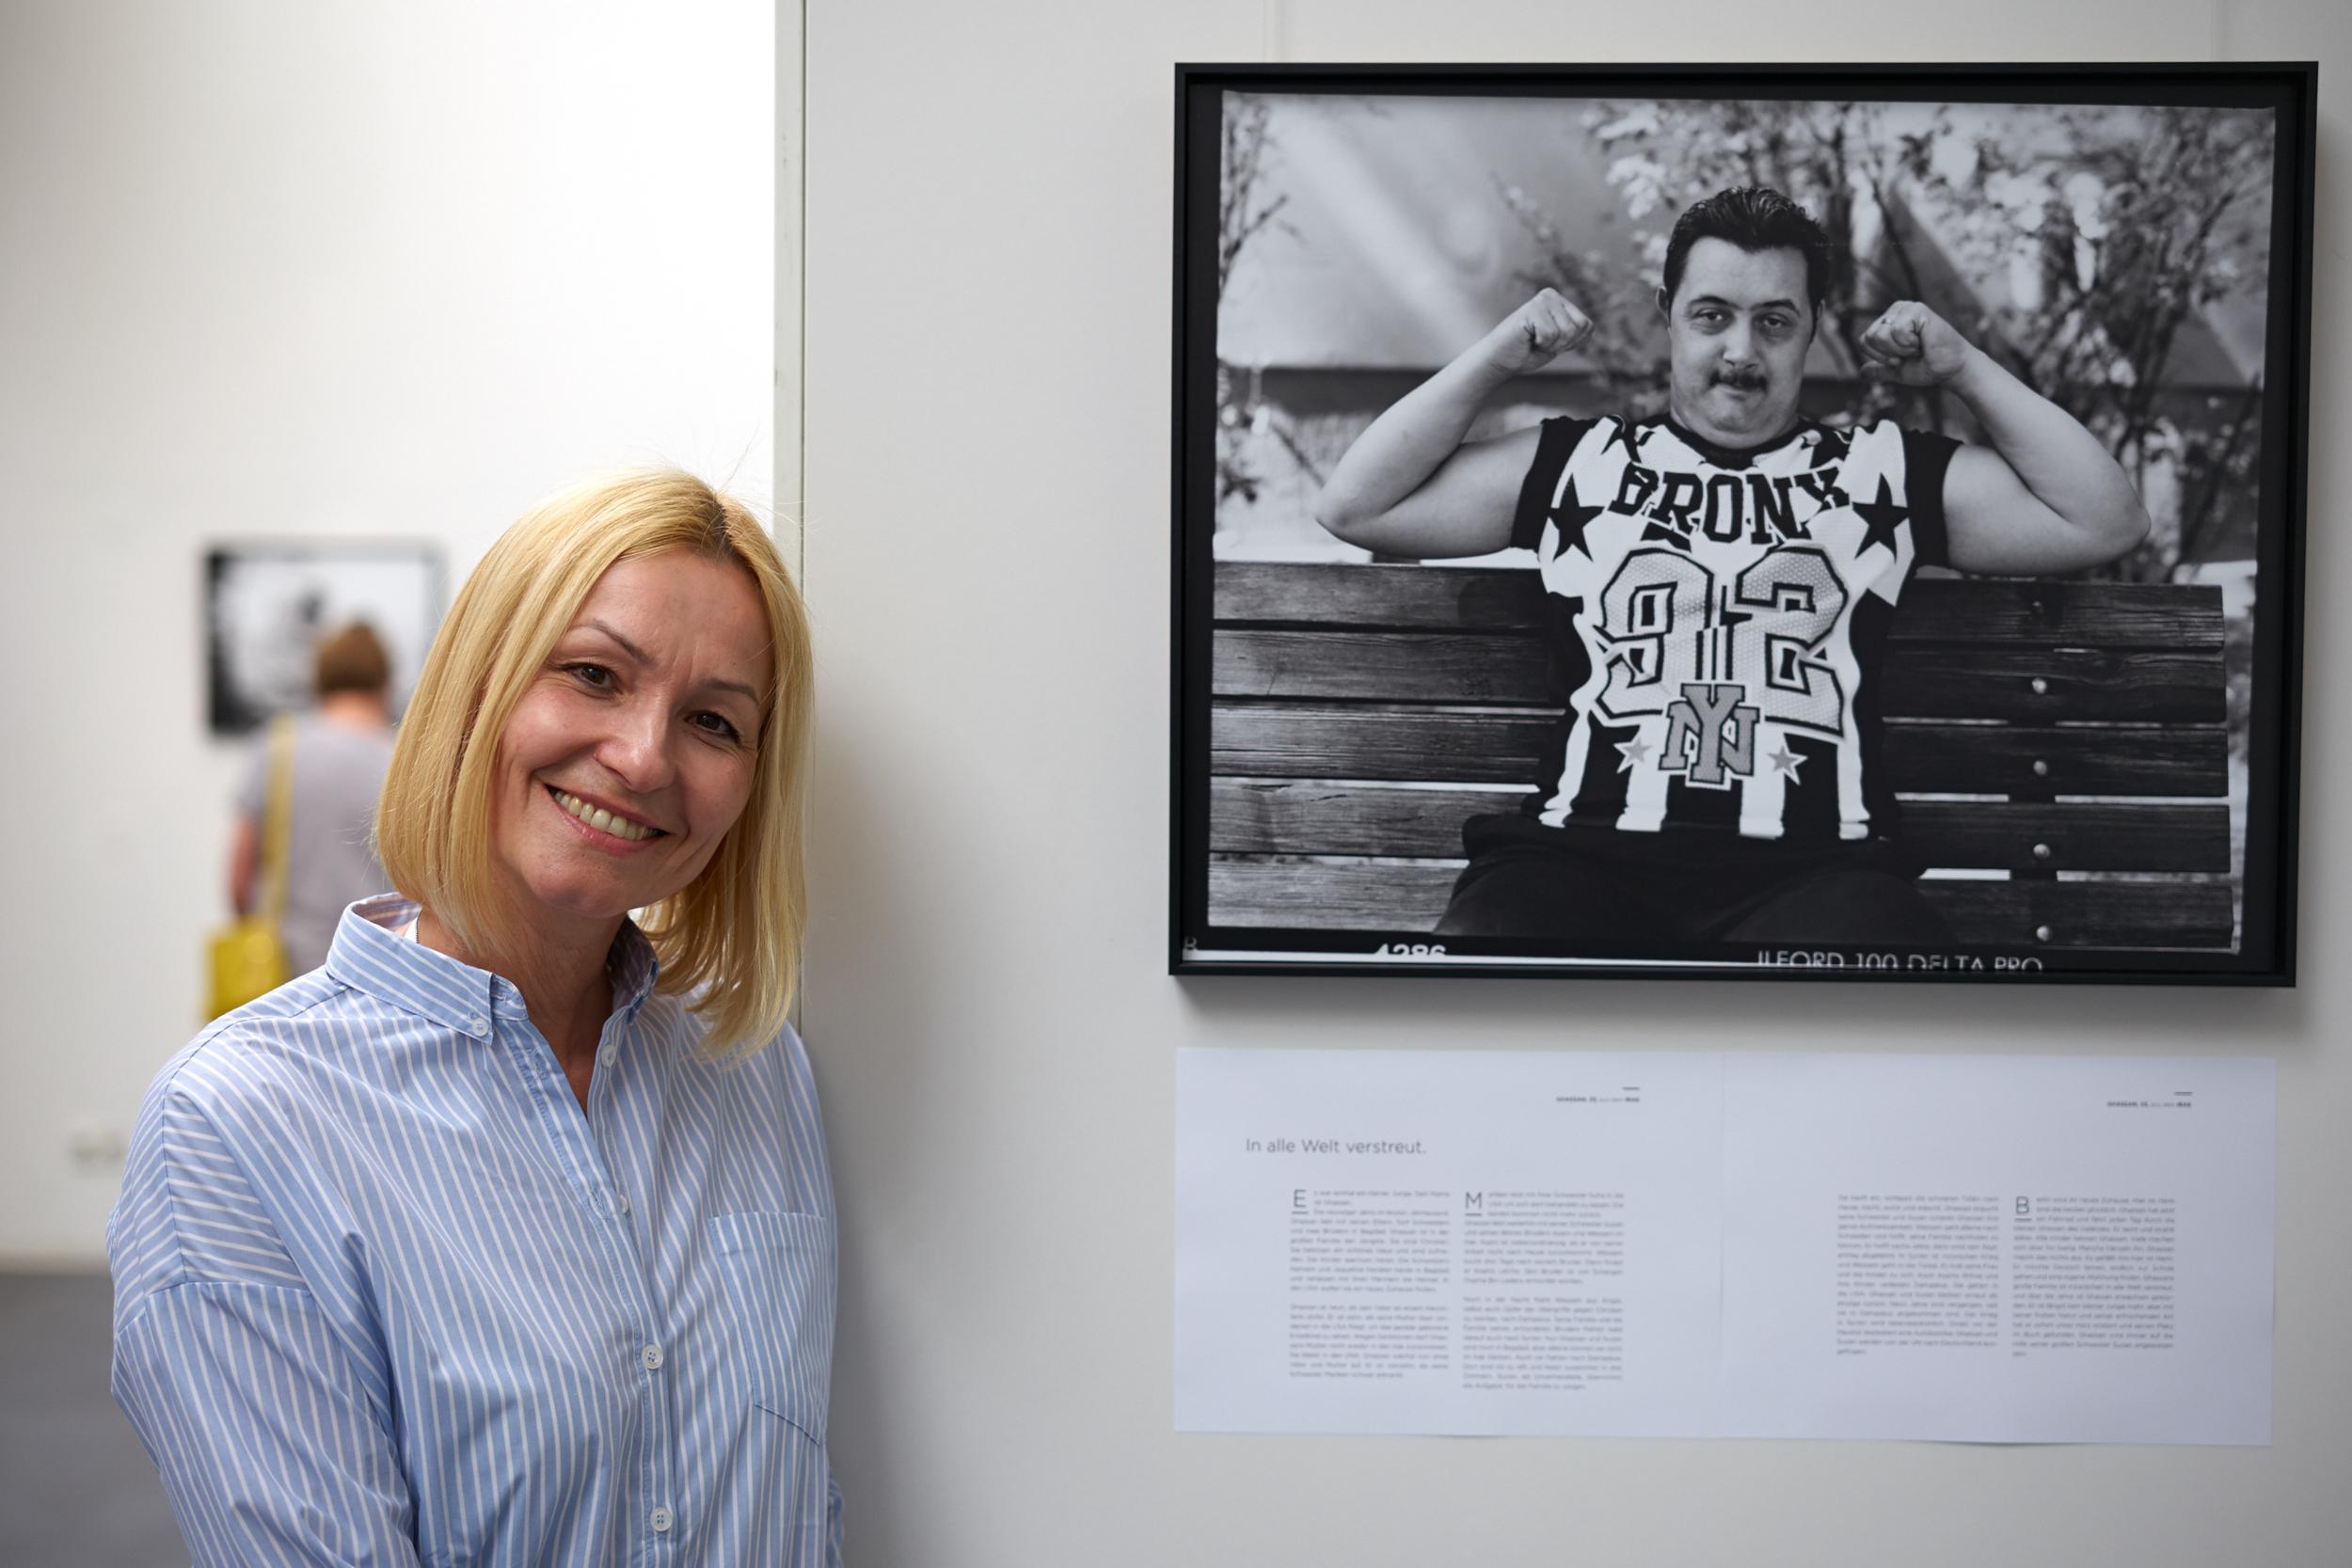 Edith Held mit Porträt_print (1,2 Mb)     Edith Held mit Porträt_web  (672 kb)